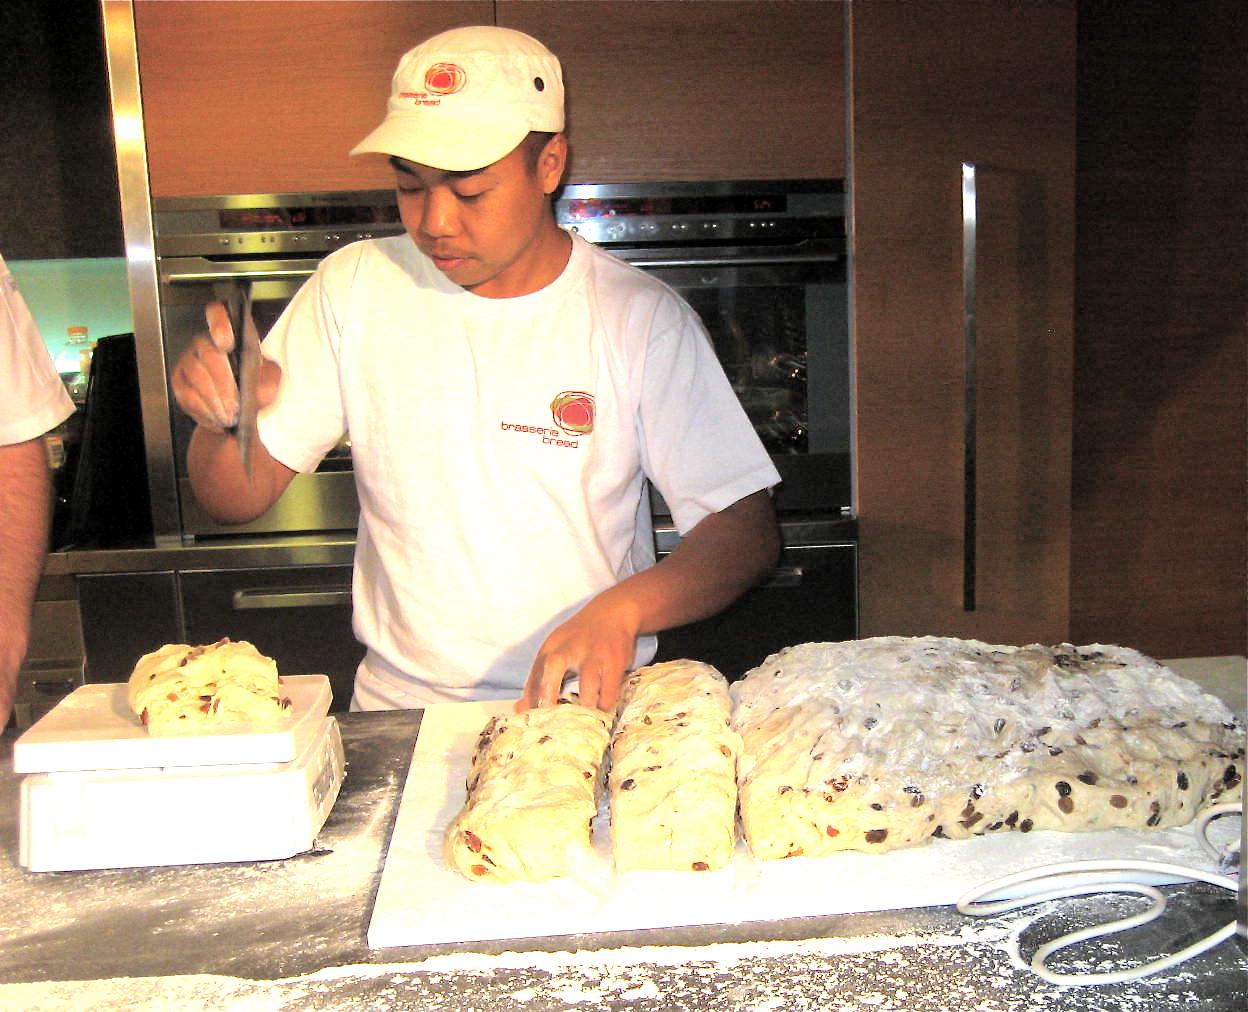 Brasserie Breads in the making